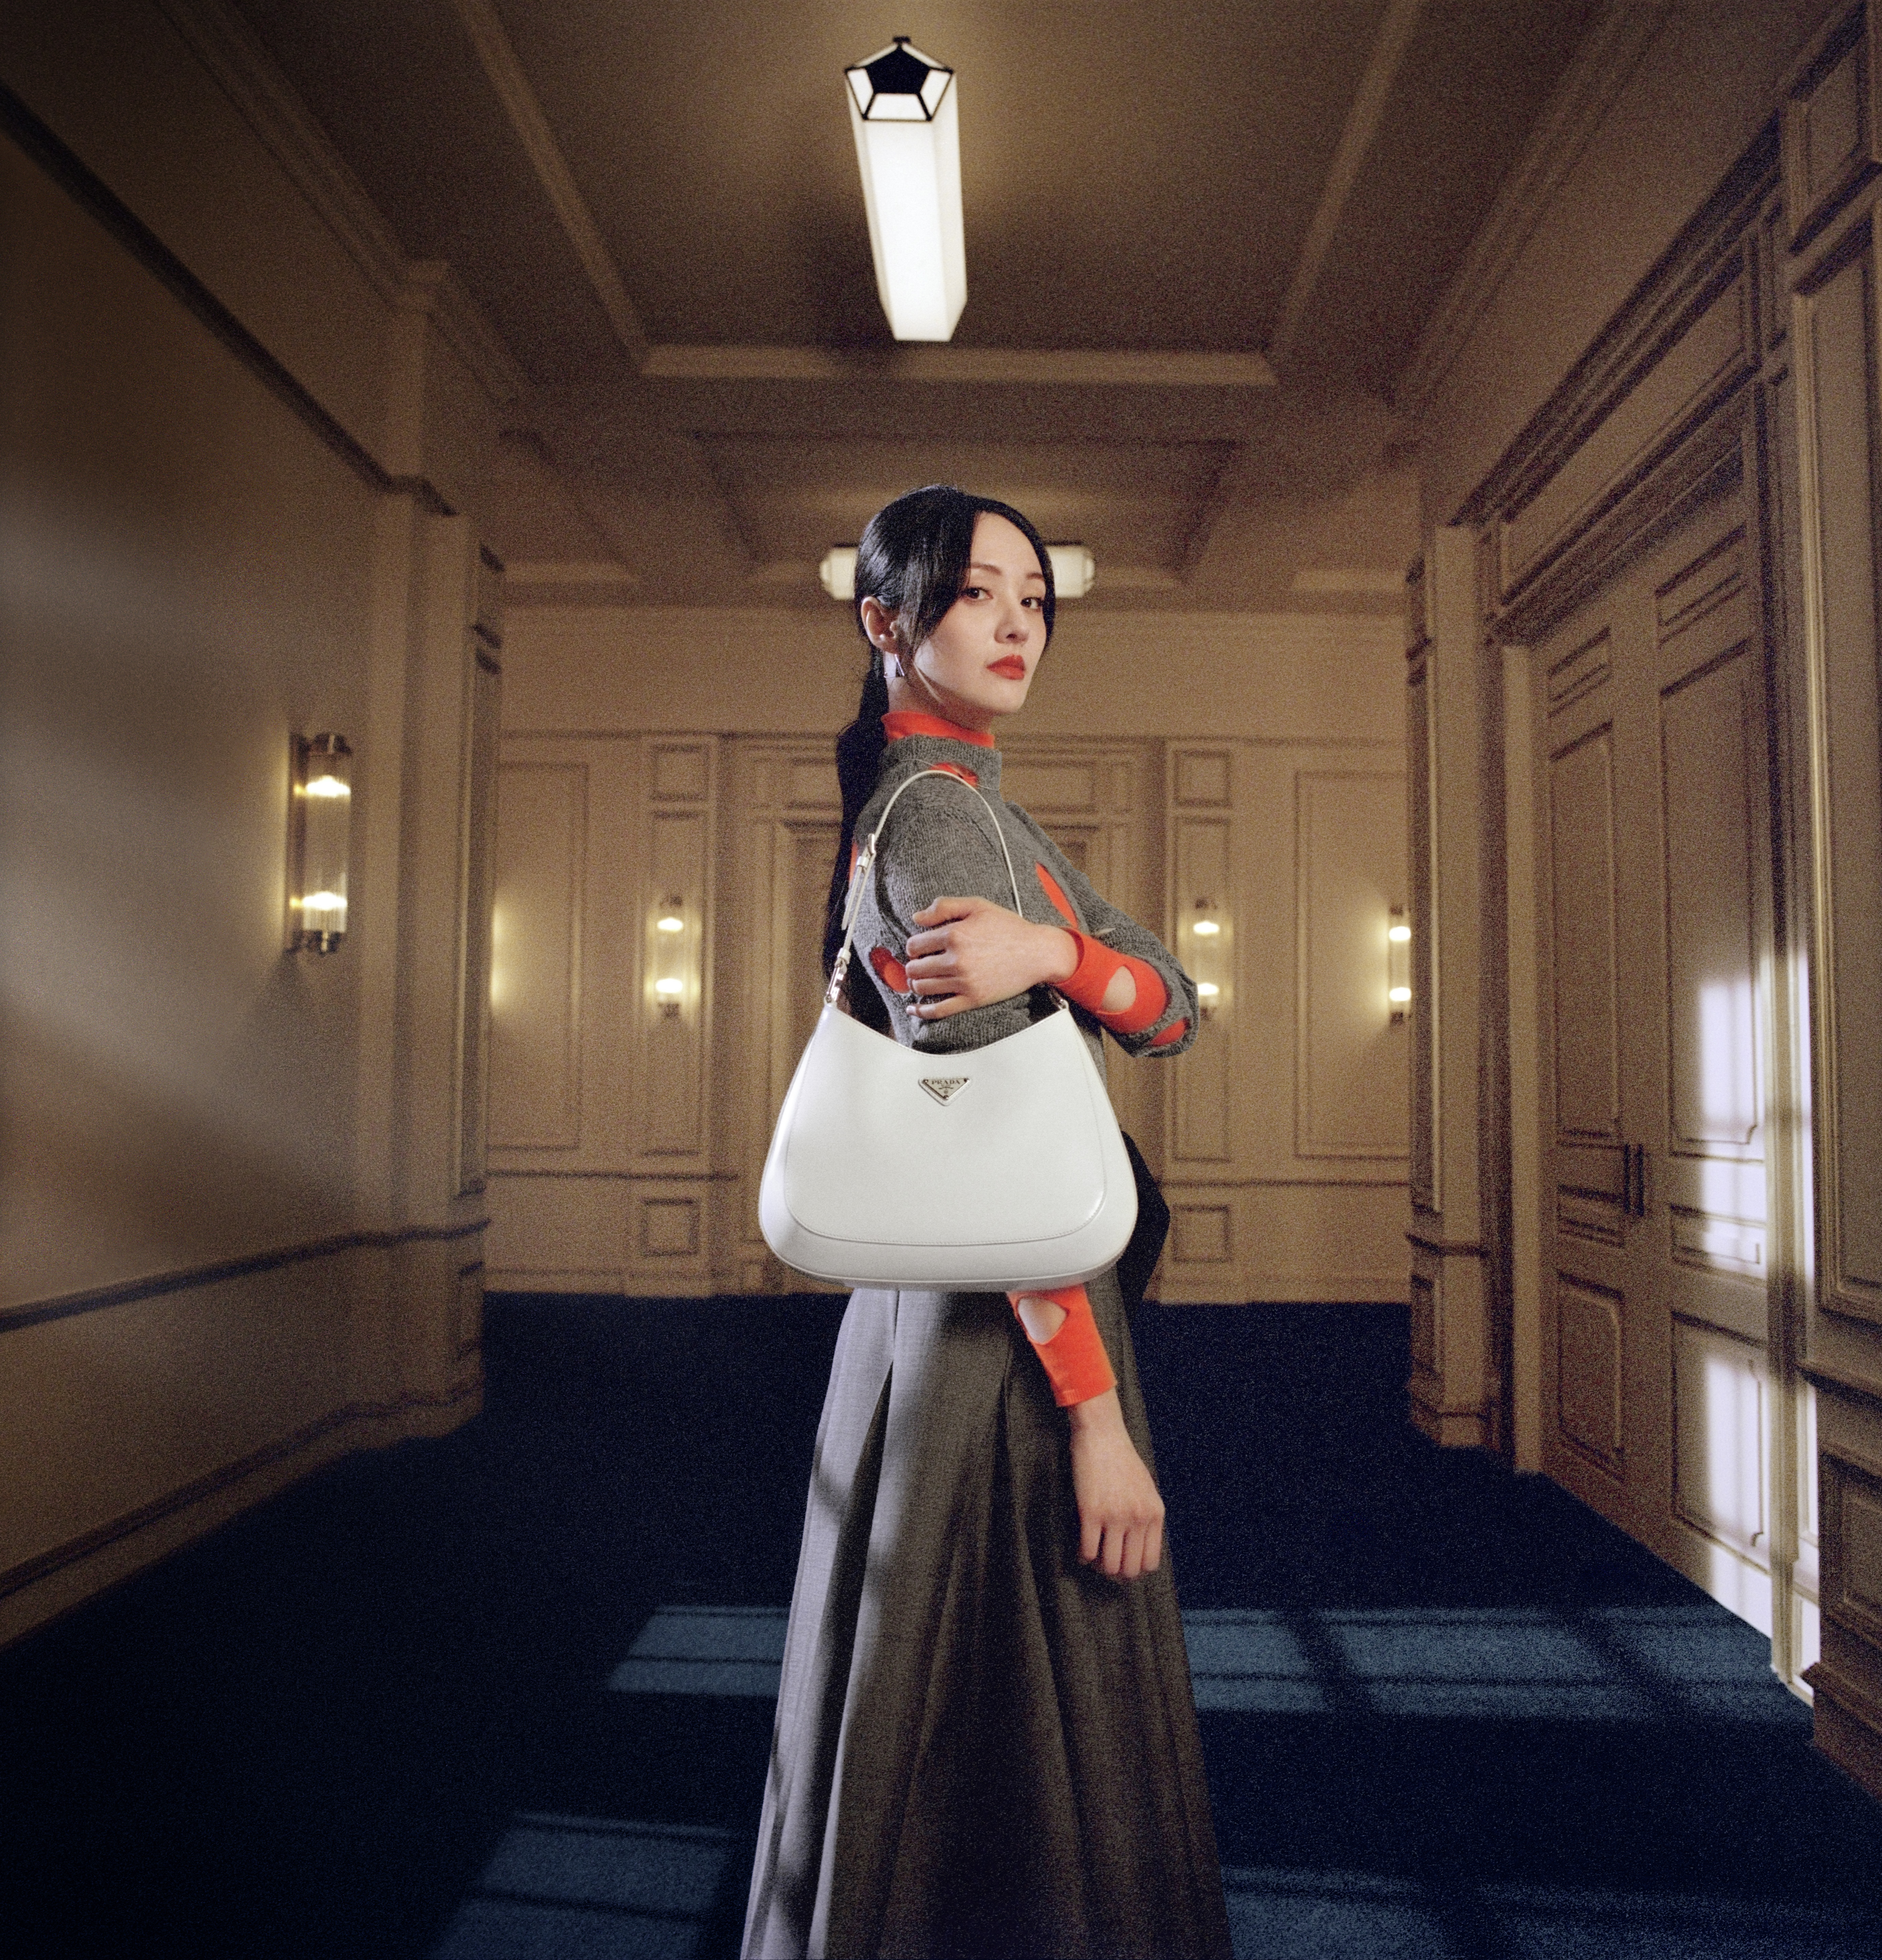 Prada Under Fire in China for Brand Ambassador Alleged Child Dispute